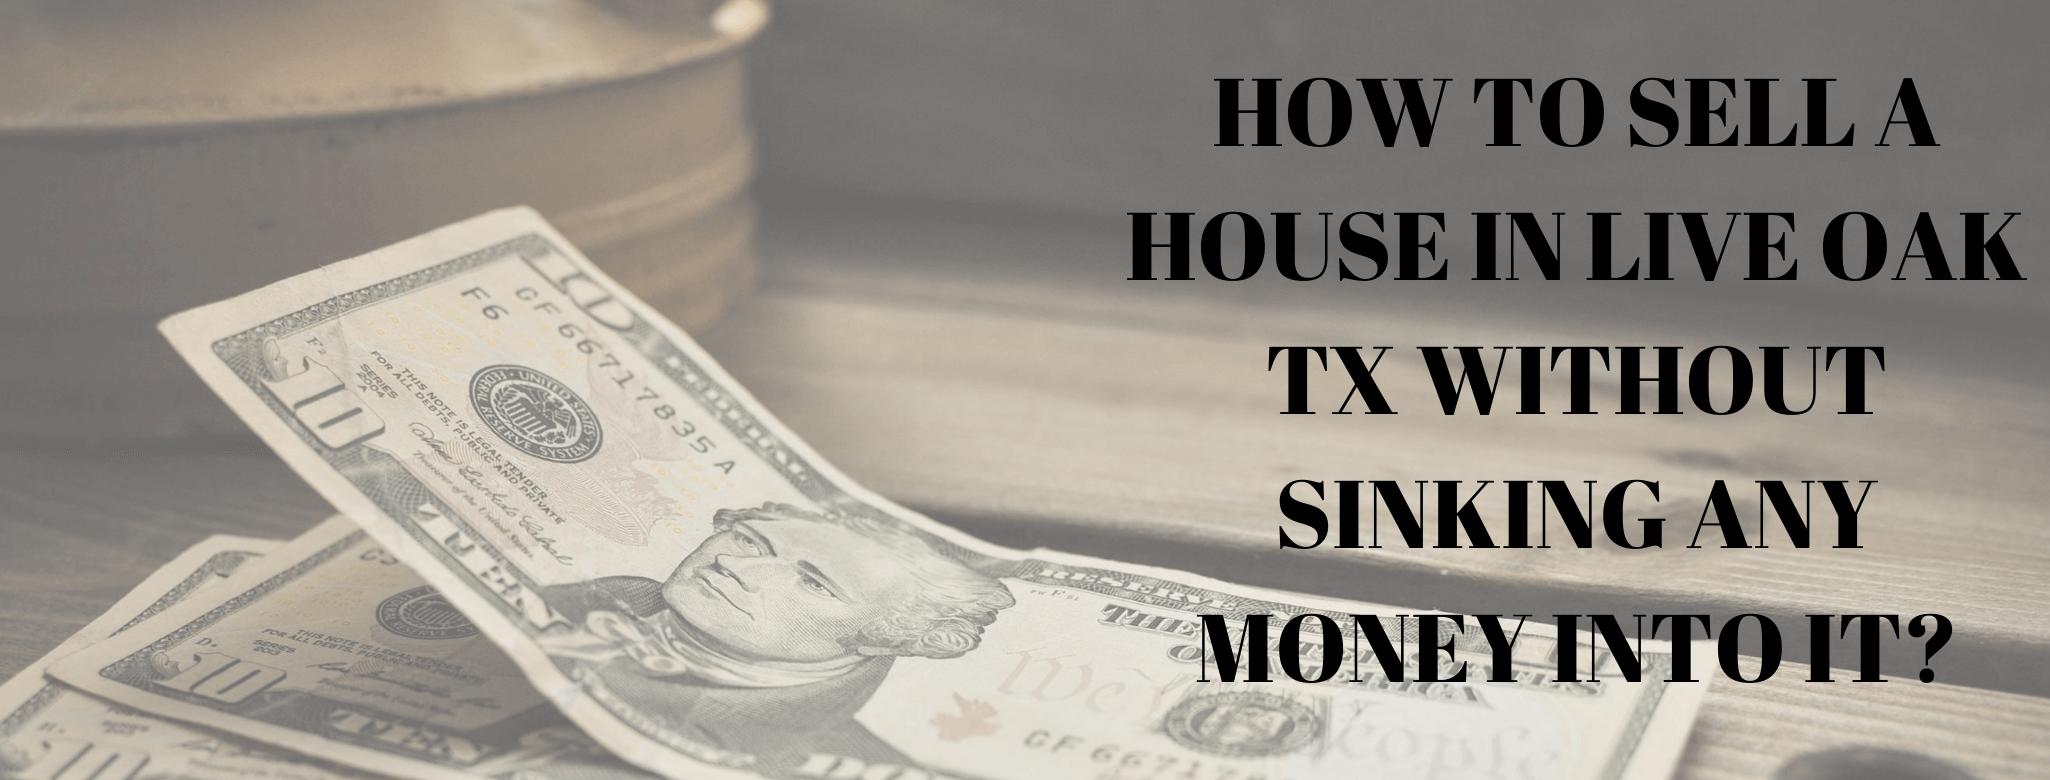 we buy properties in Live Oak TX